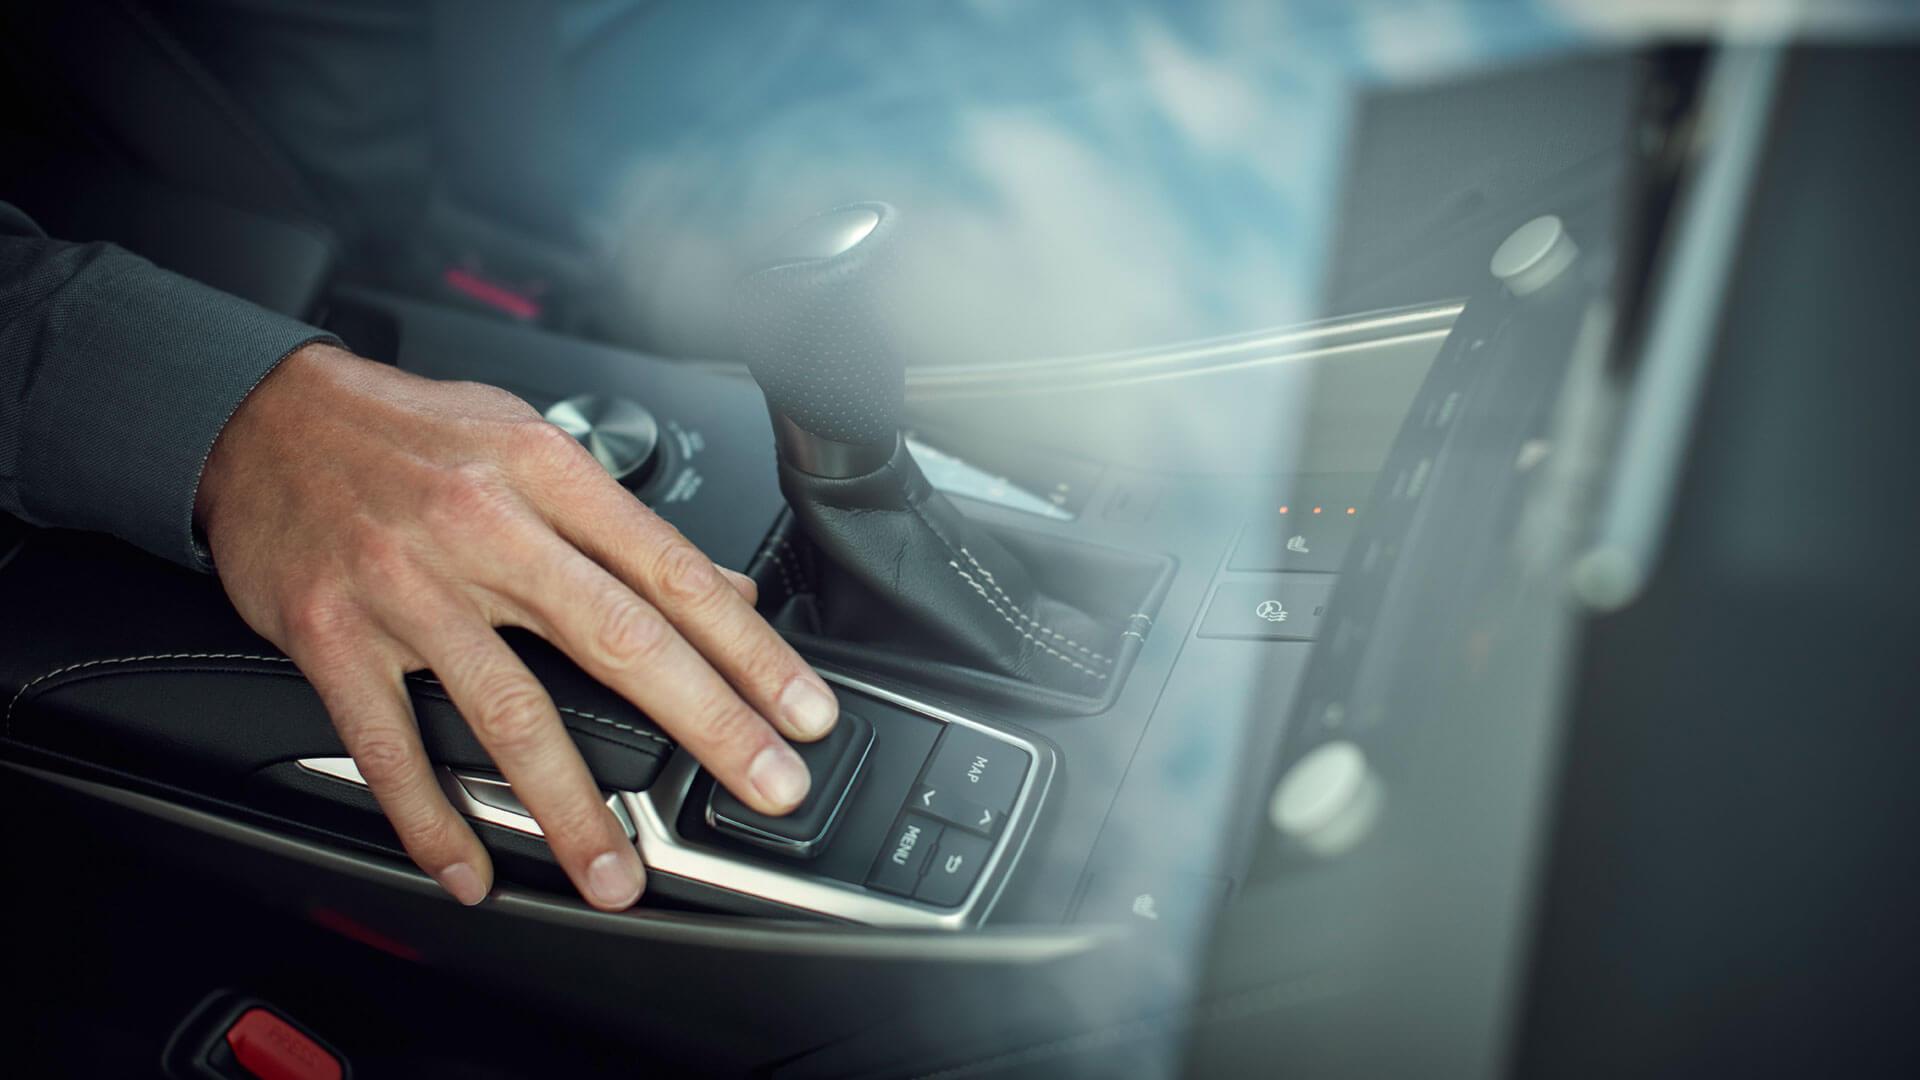 Lexus IS Touchpad